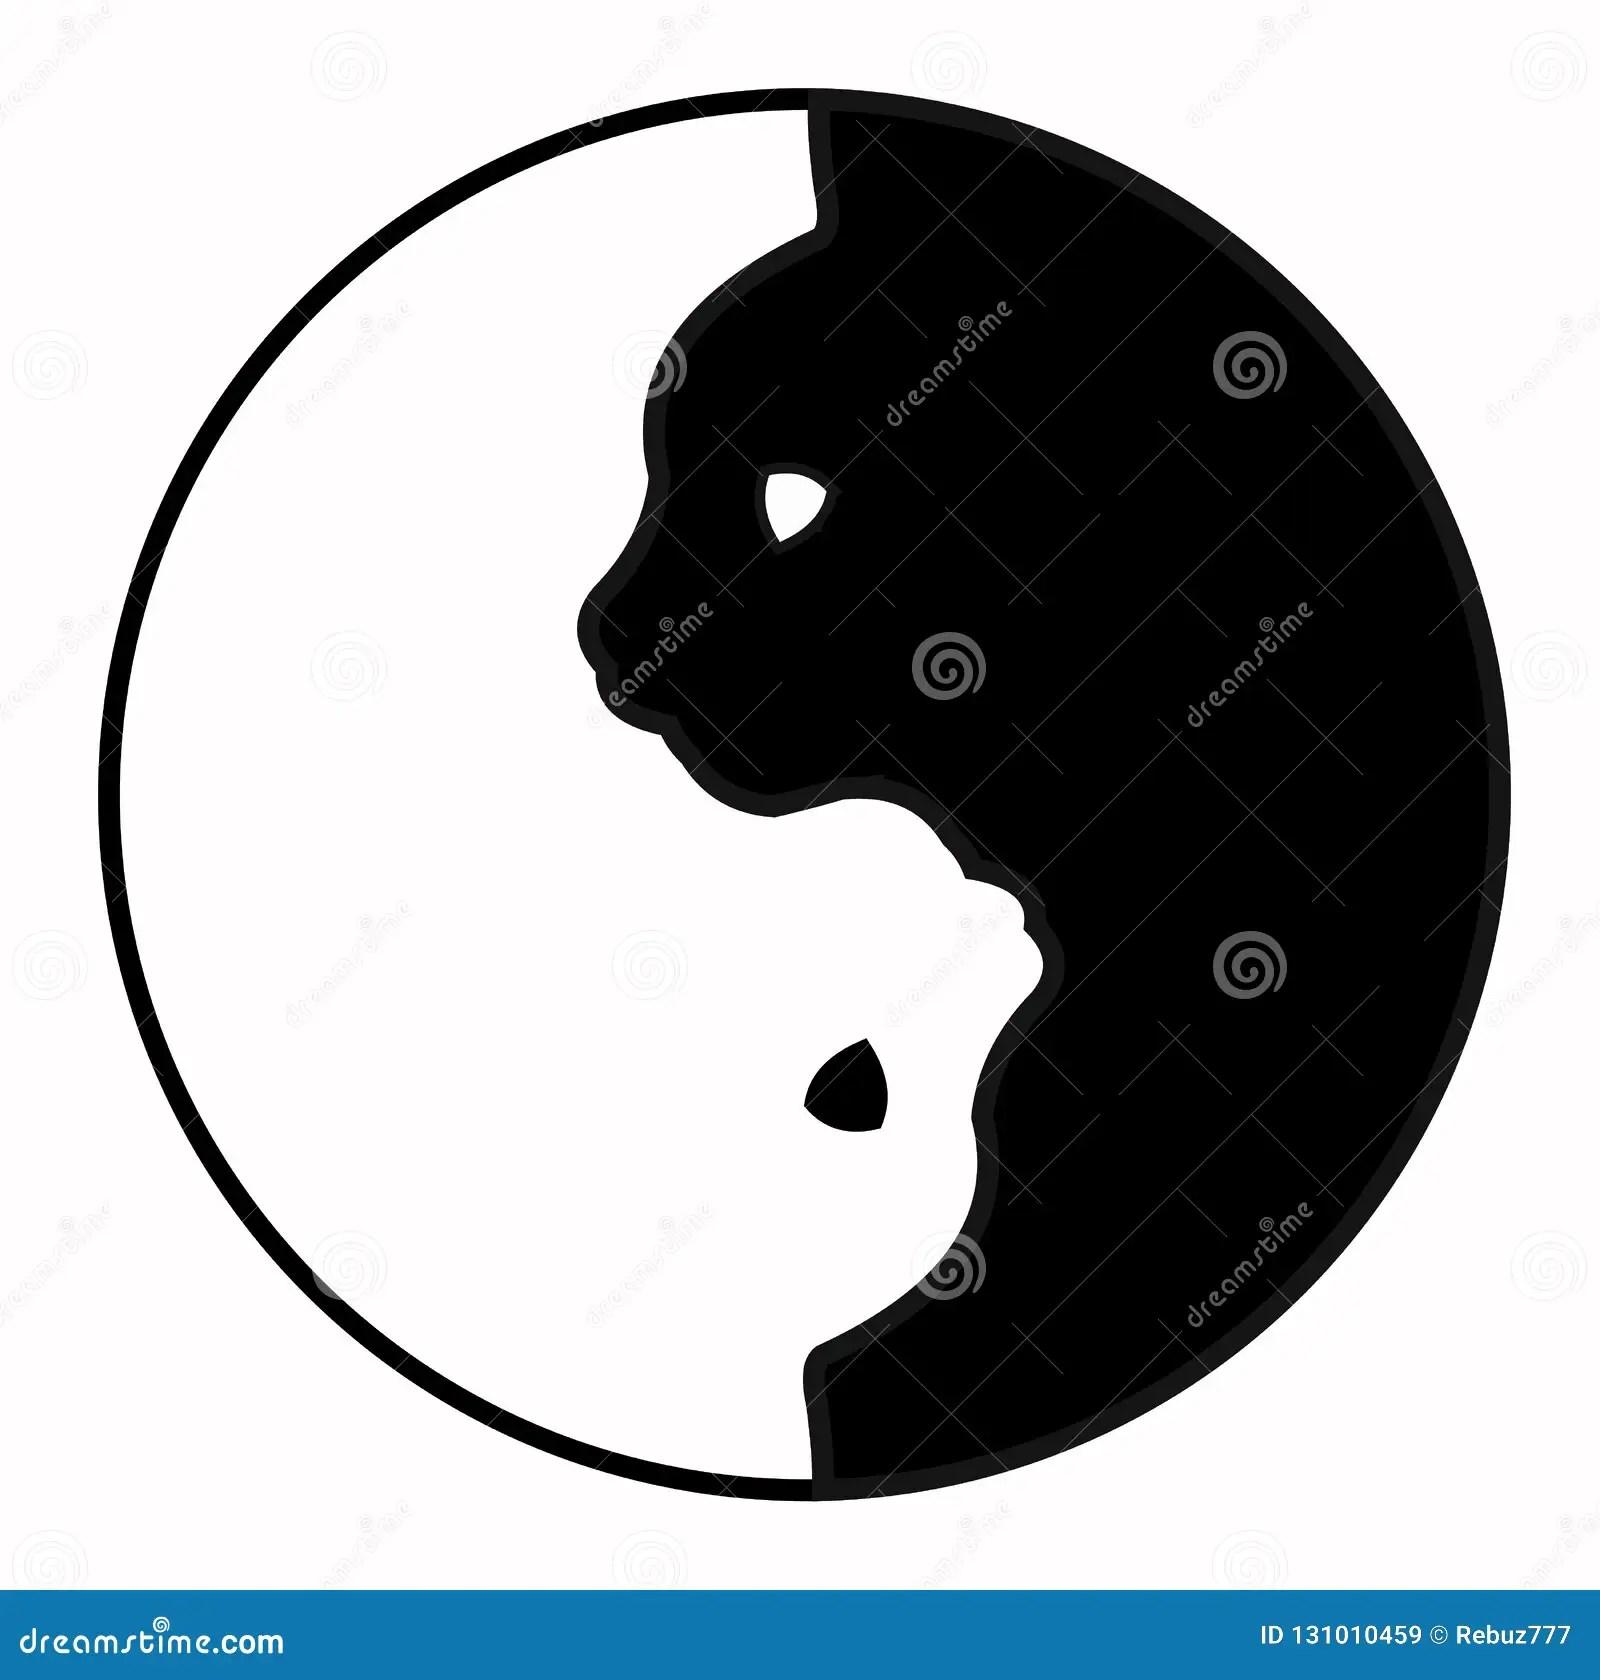 buddhism yin yang cats